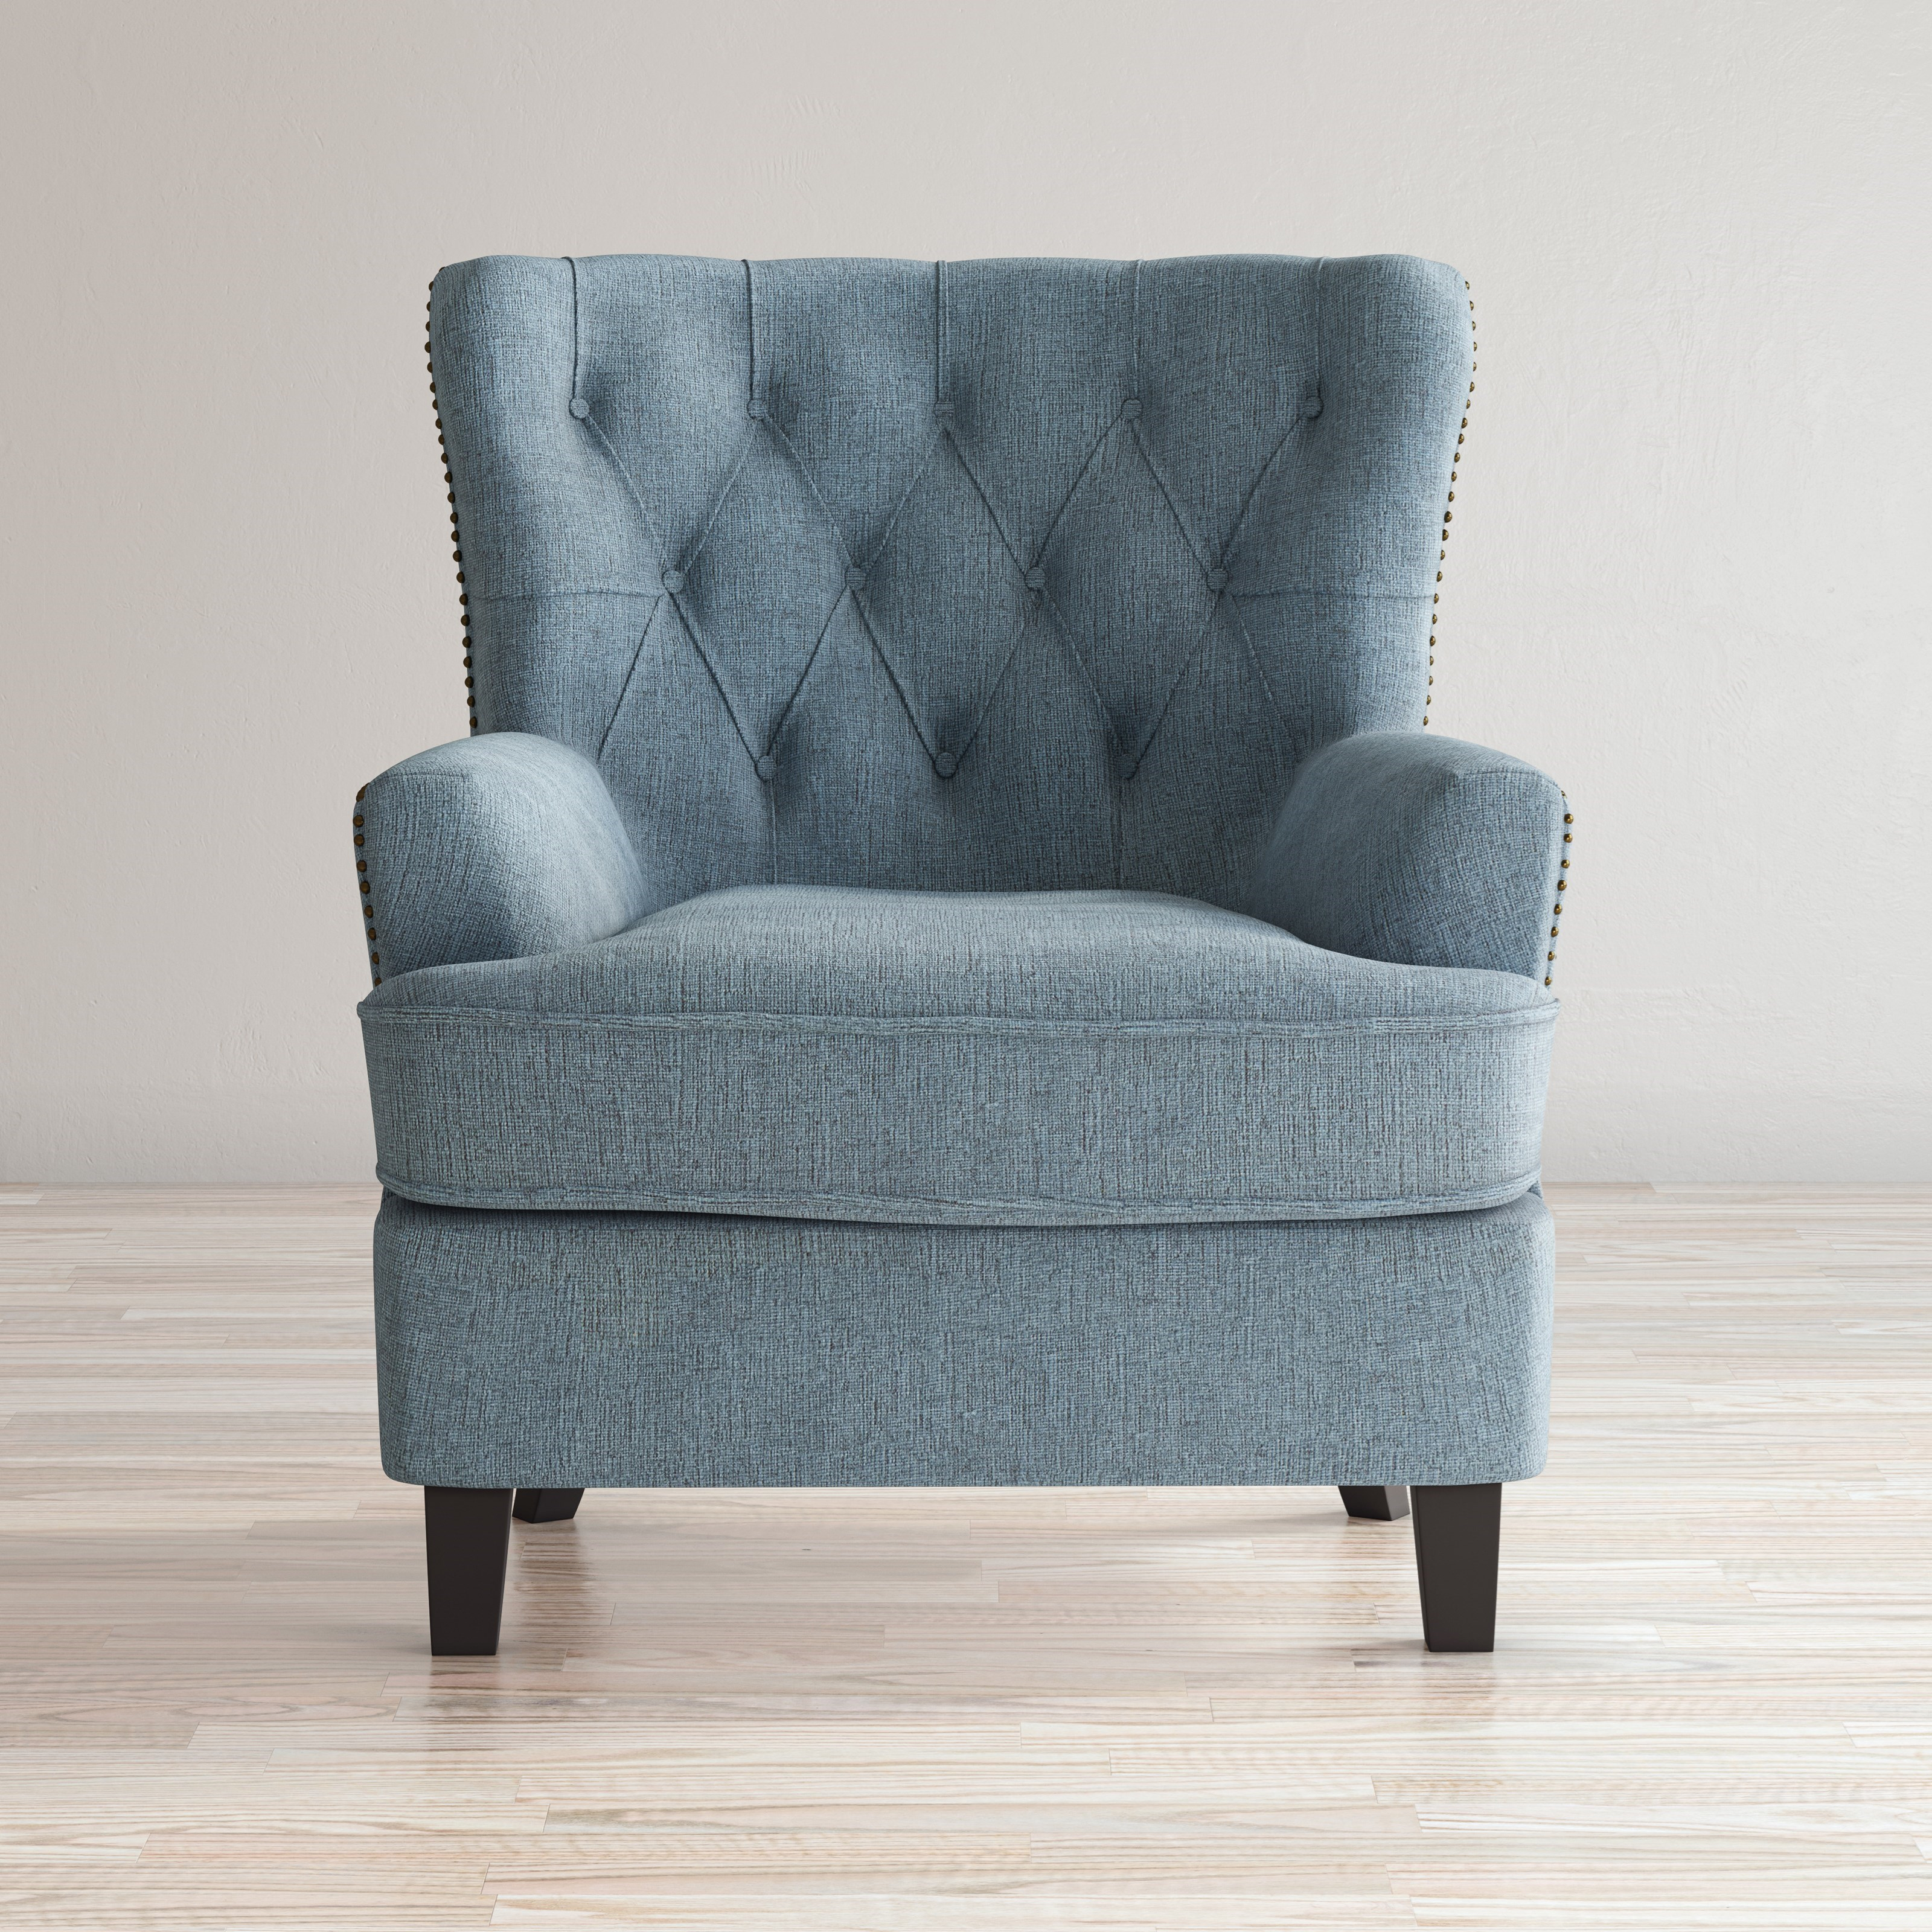 Bryson Bryson Chair by Jofran at Jofran